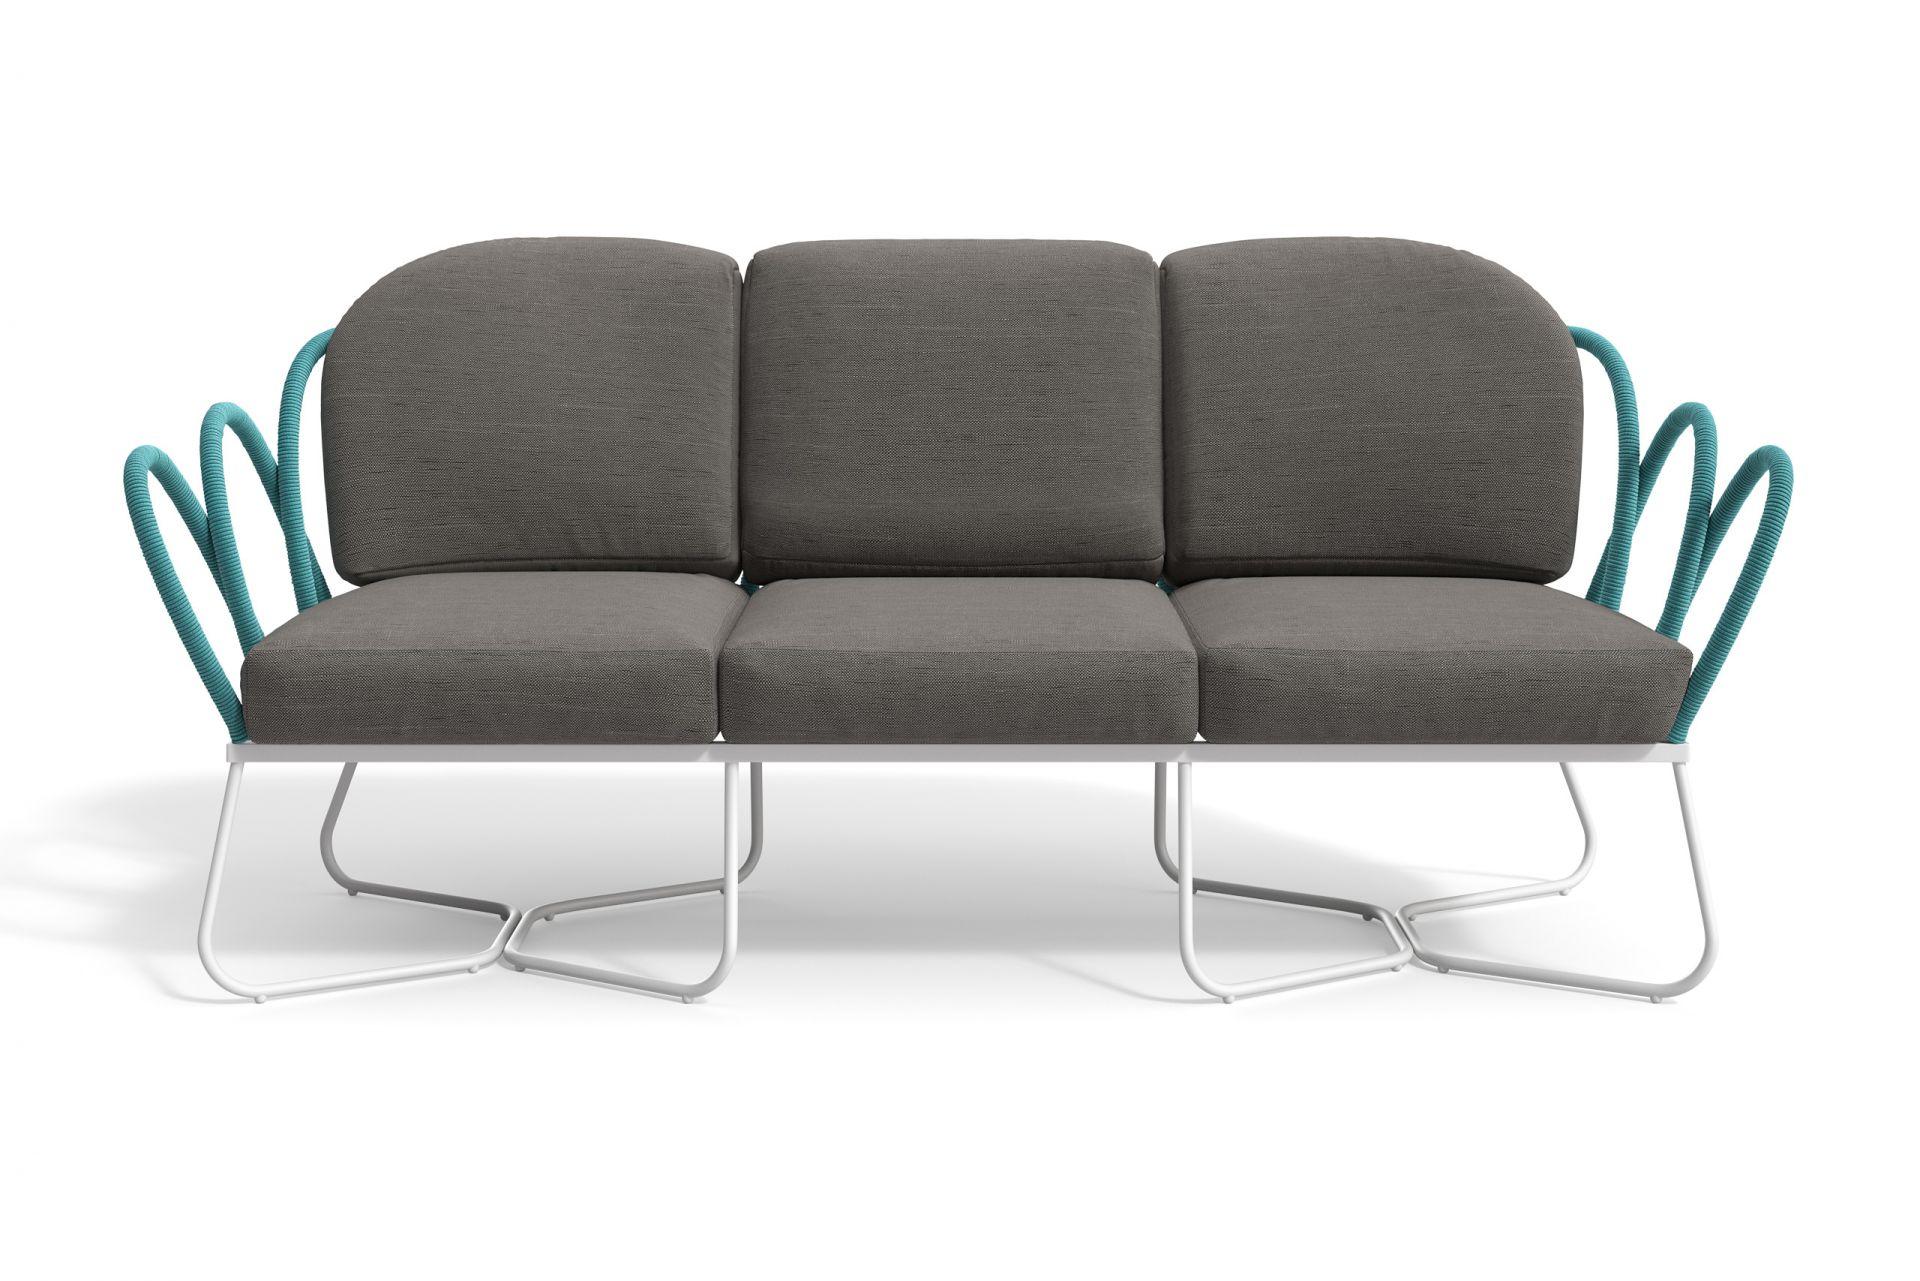 SANTORINI 3-Sitzer